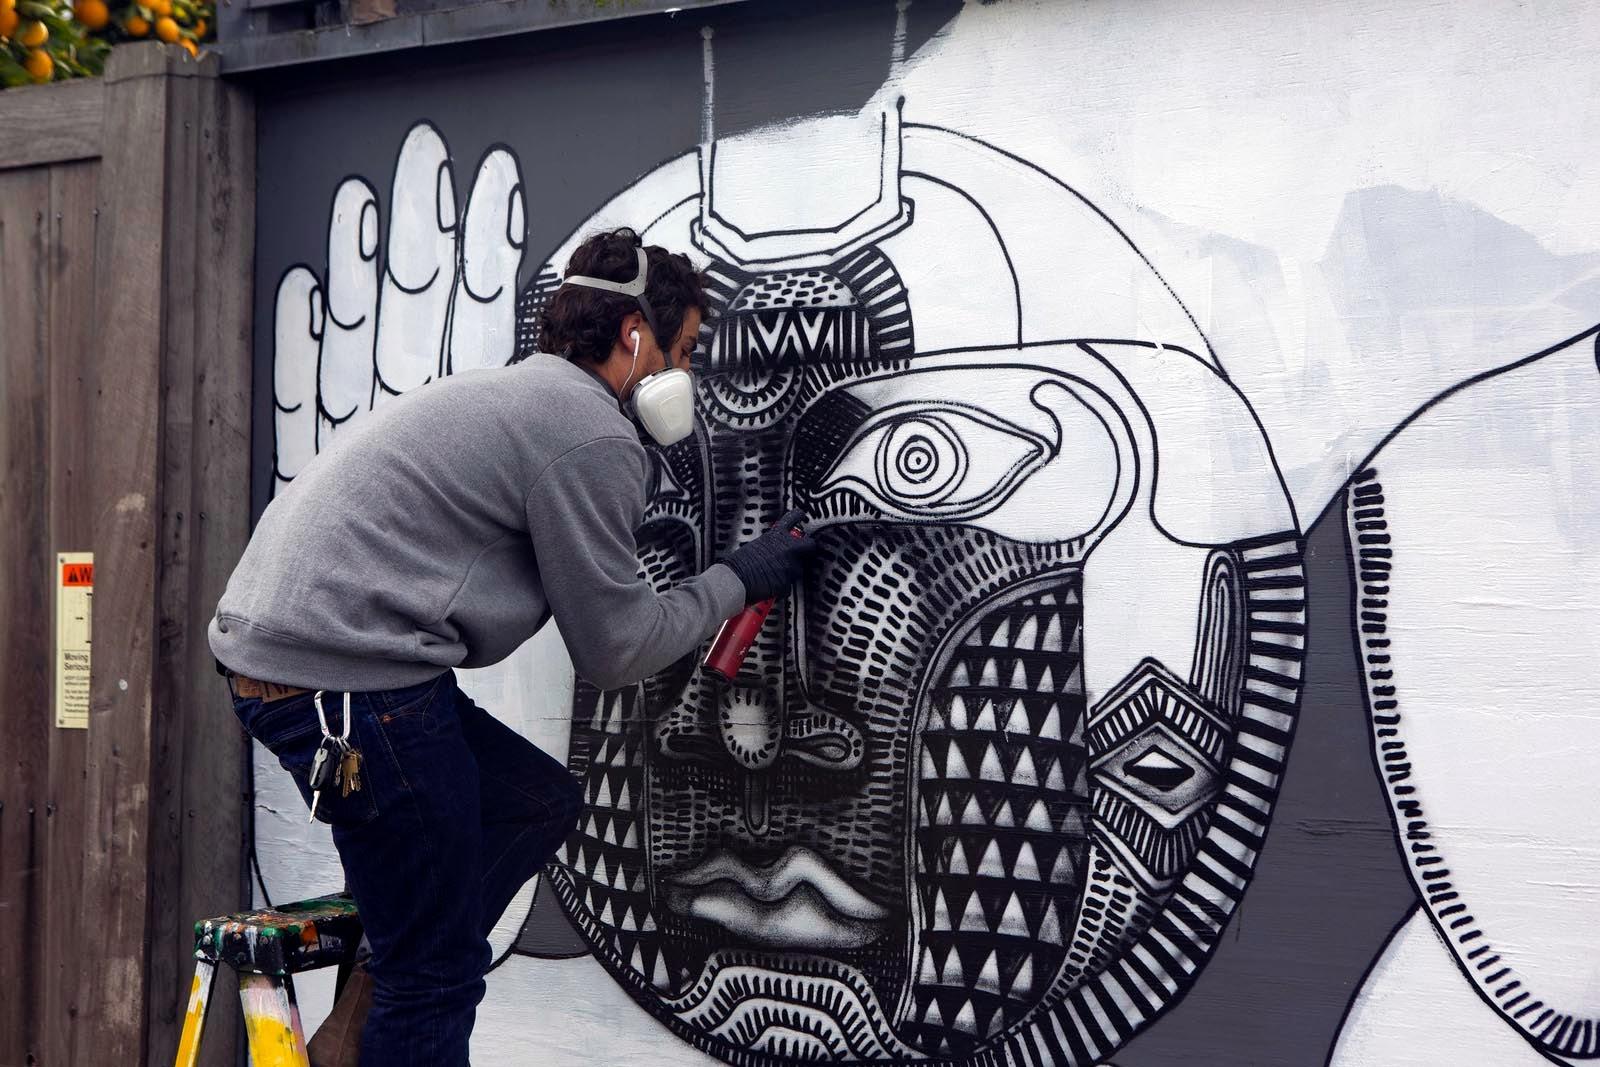 zio-ziegler-bumblebee-new-mural-in-venice-california-02